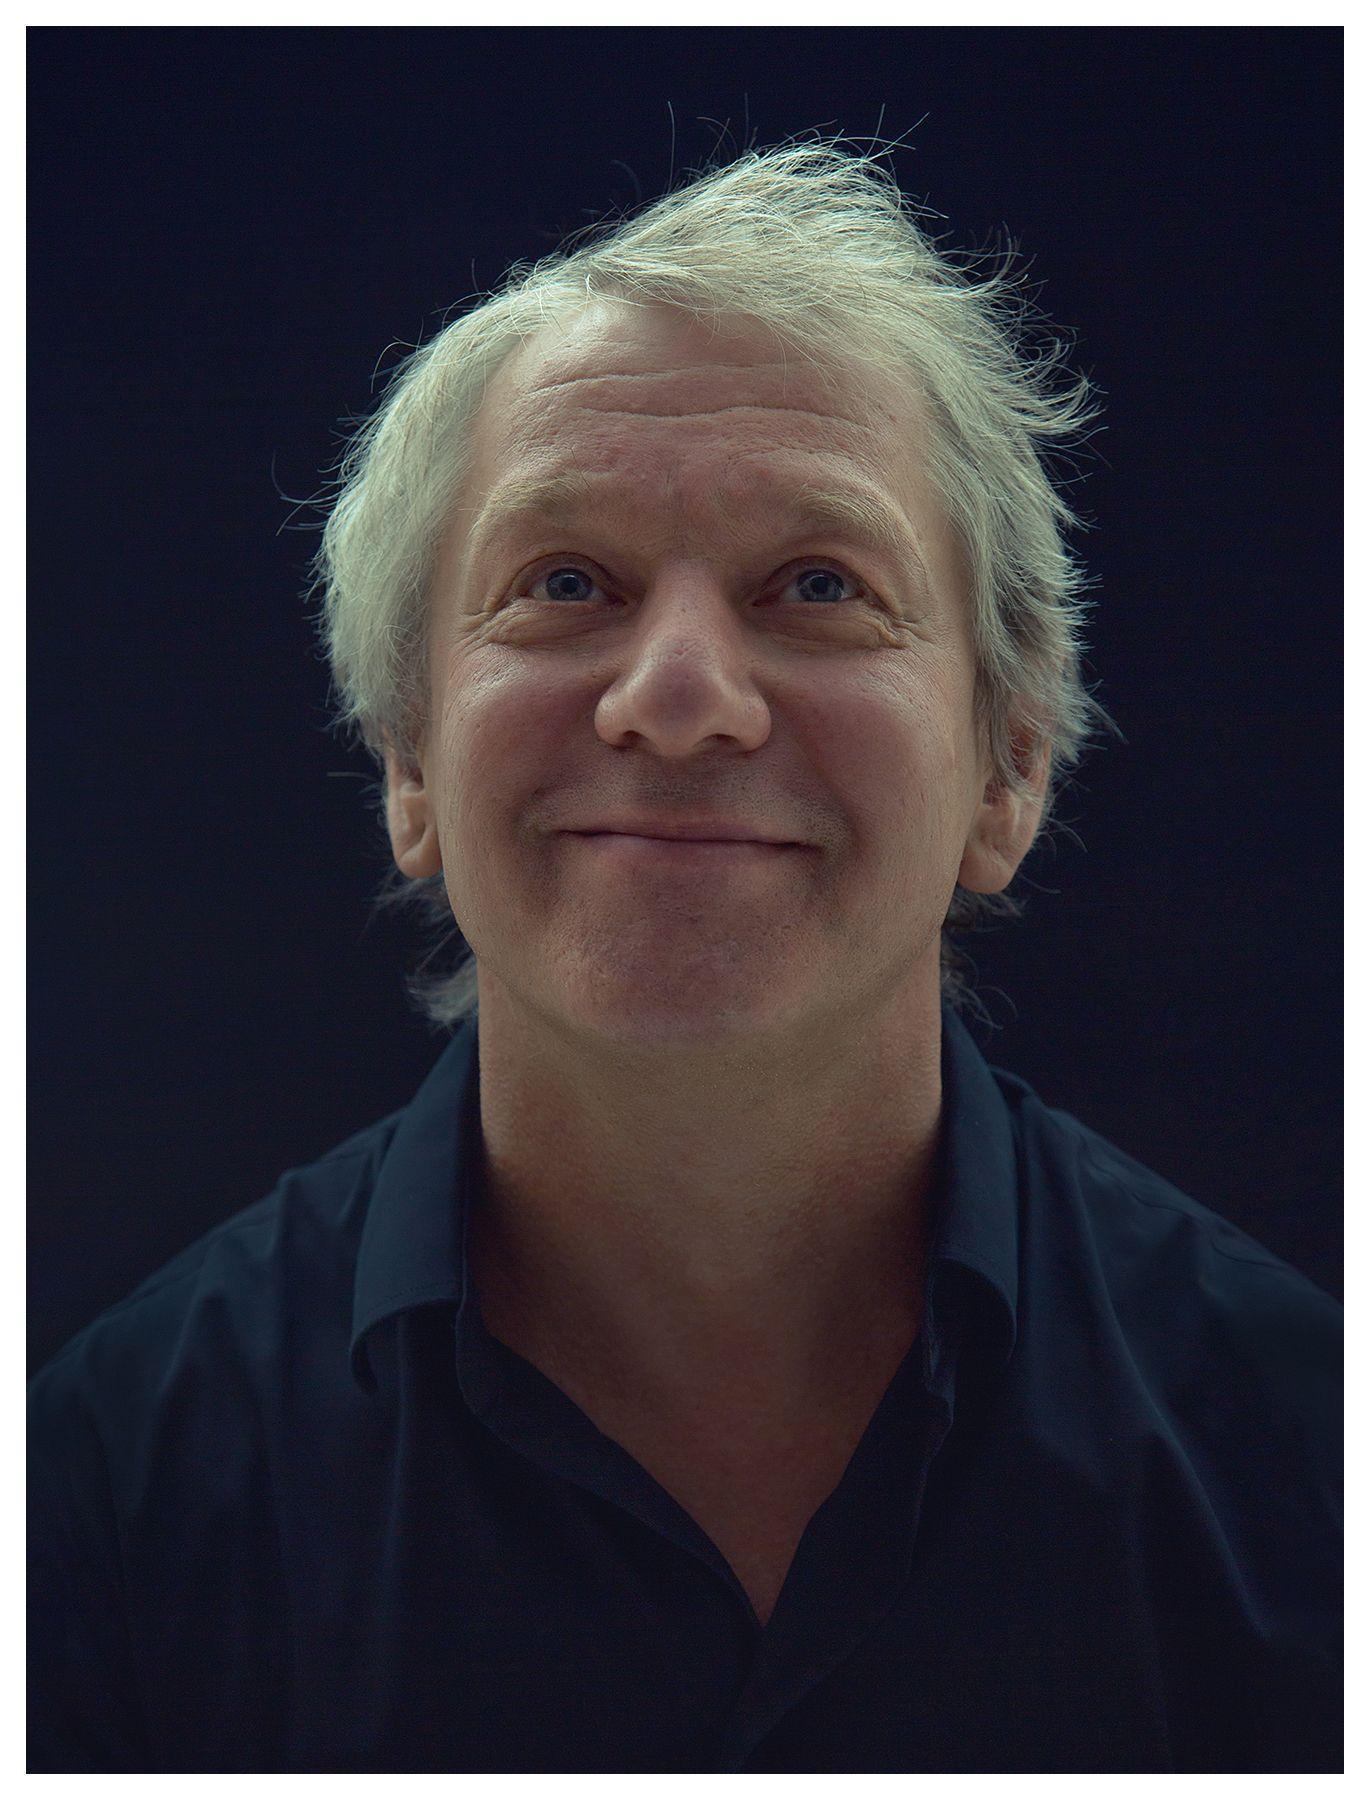 Портрет Алексея музыкант композитор балалаечник виртуоз musician composer balalaika player virtuoso